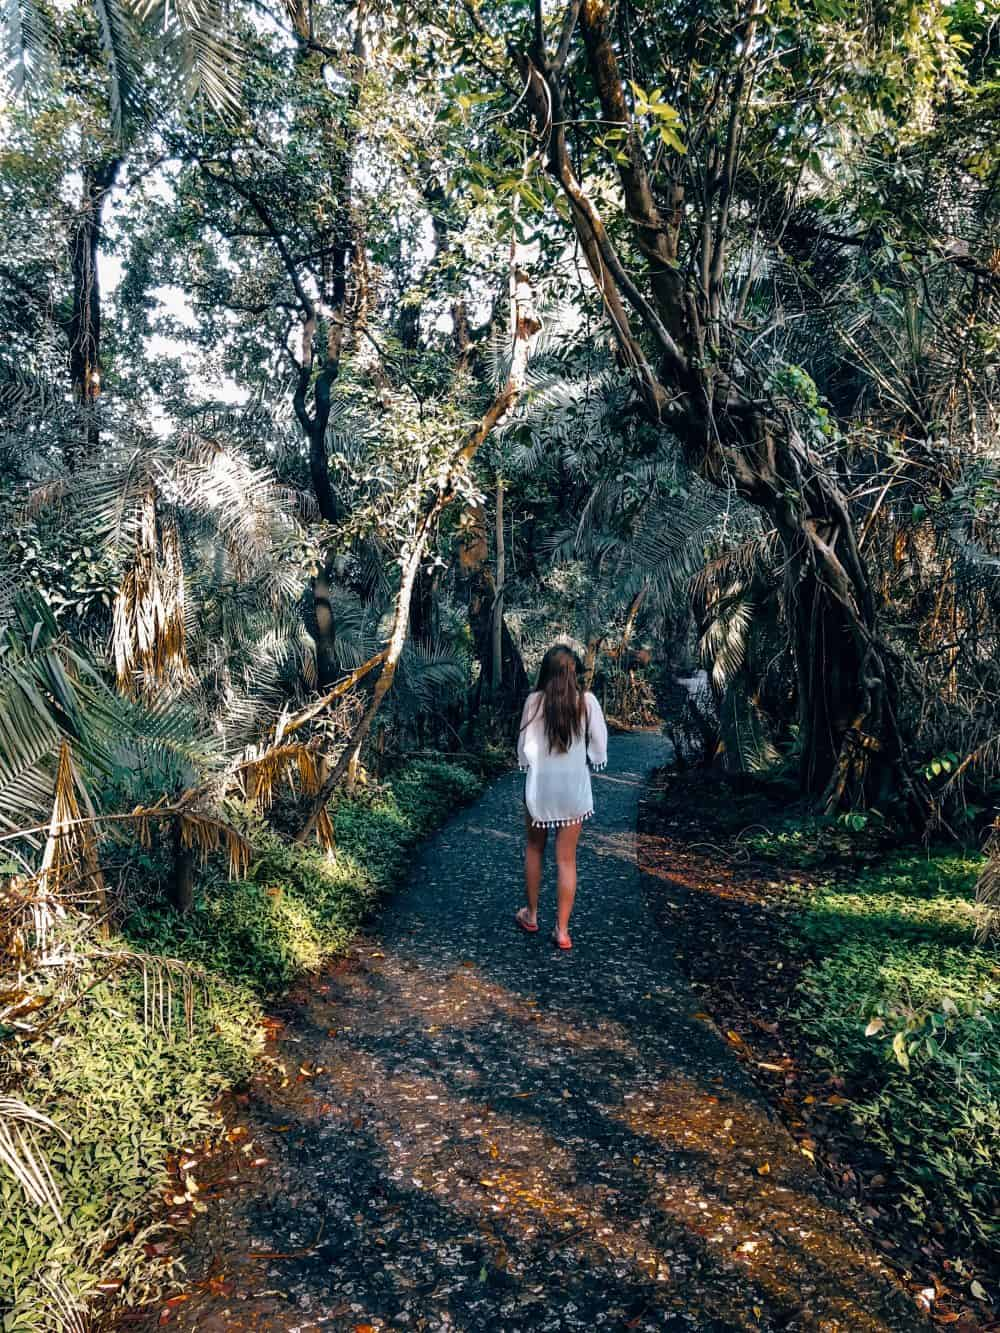 Walking through Victoria Falls National Park in Zimbabwe